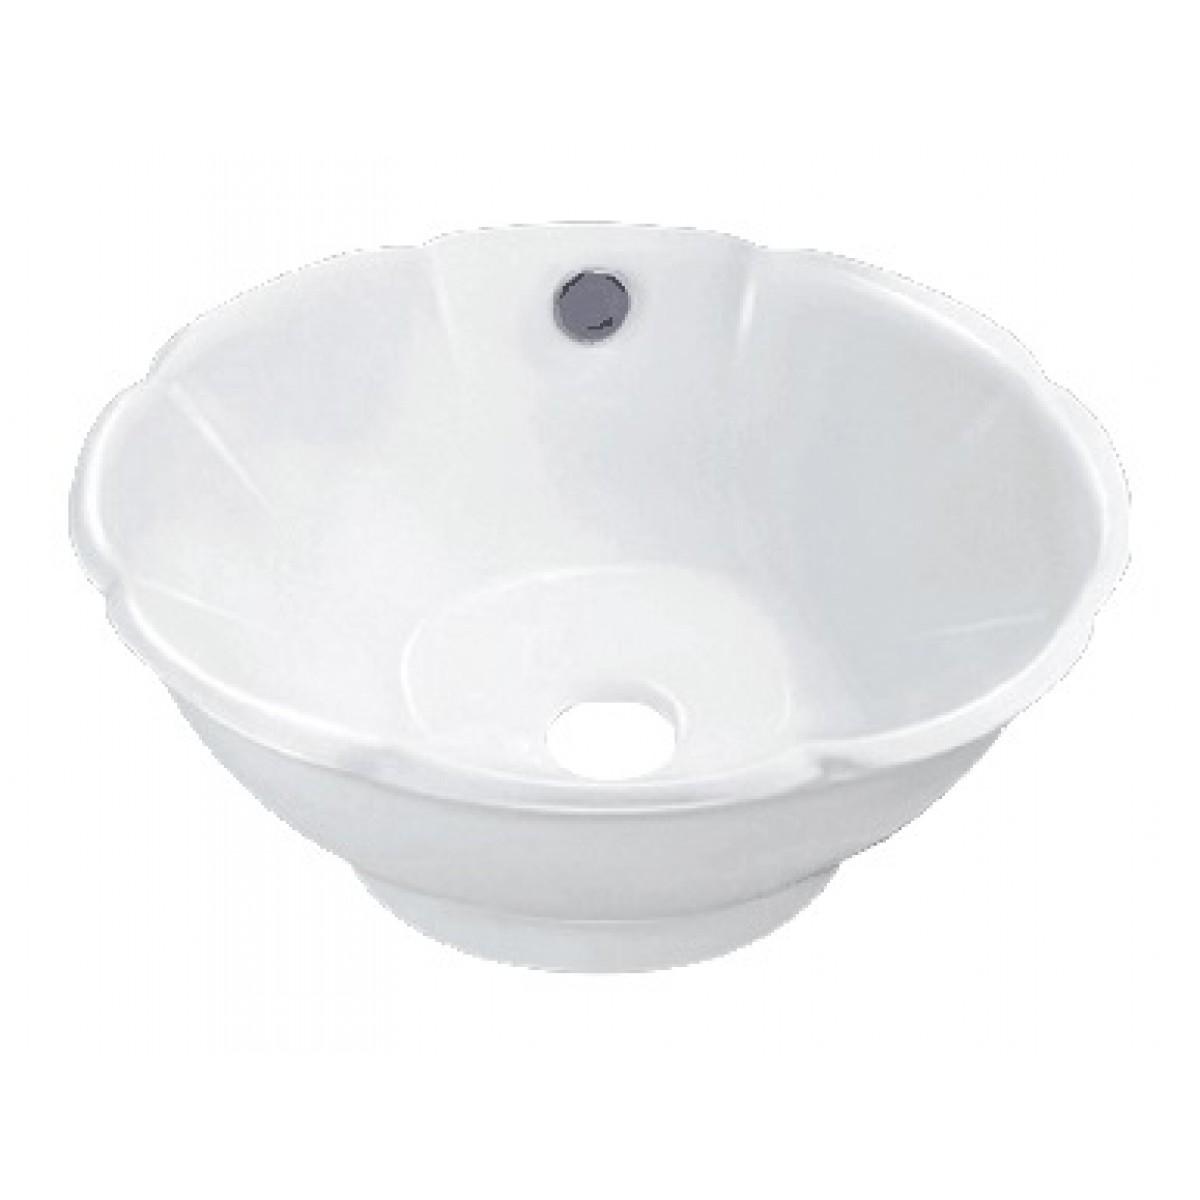 Porcelain Ceramic Single Hole Countertop Bathroom Vessel